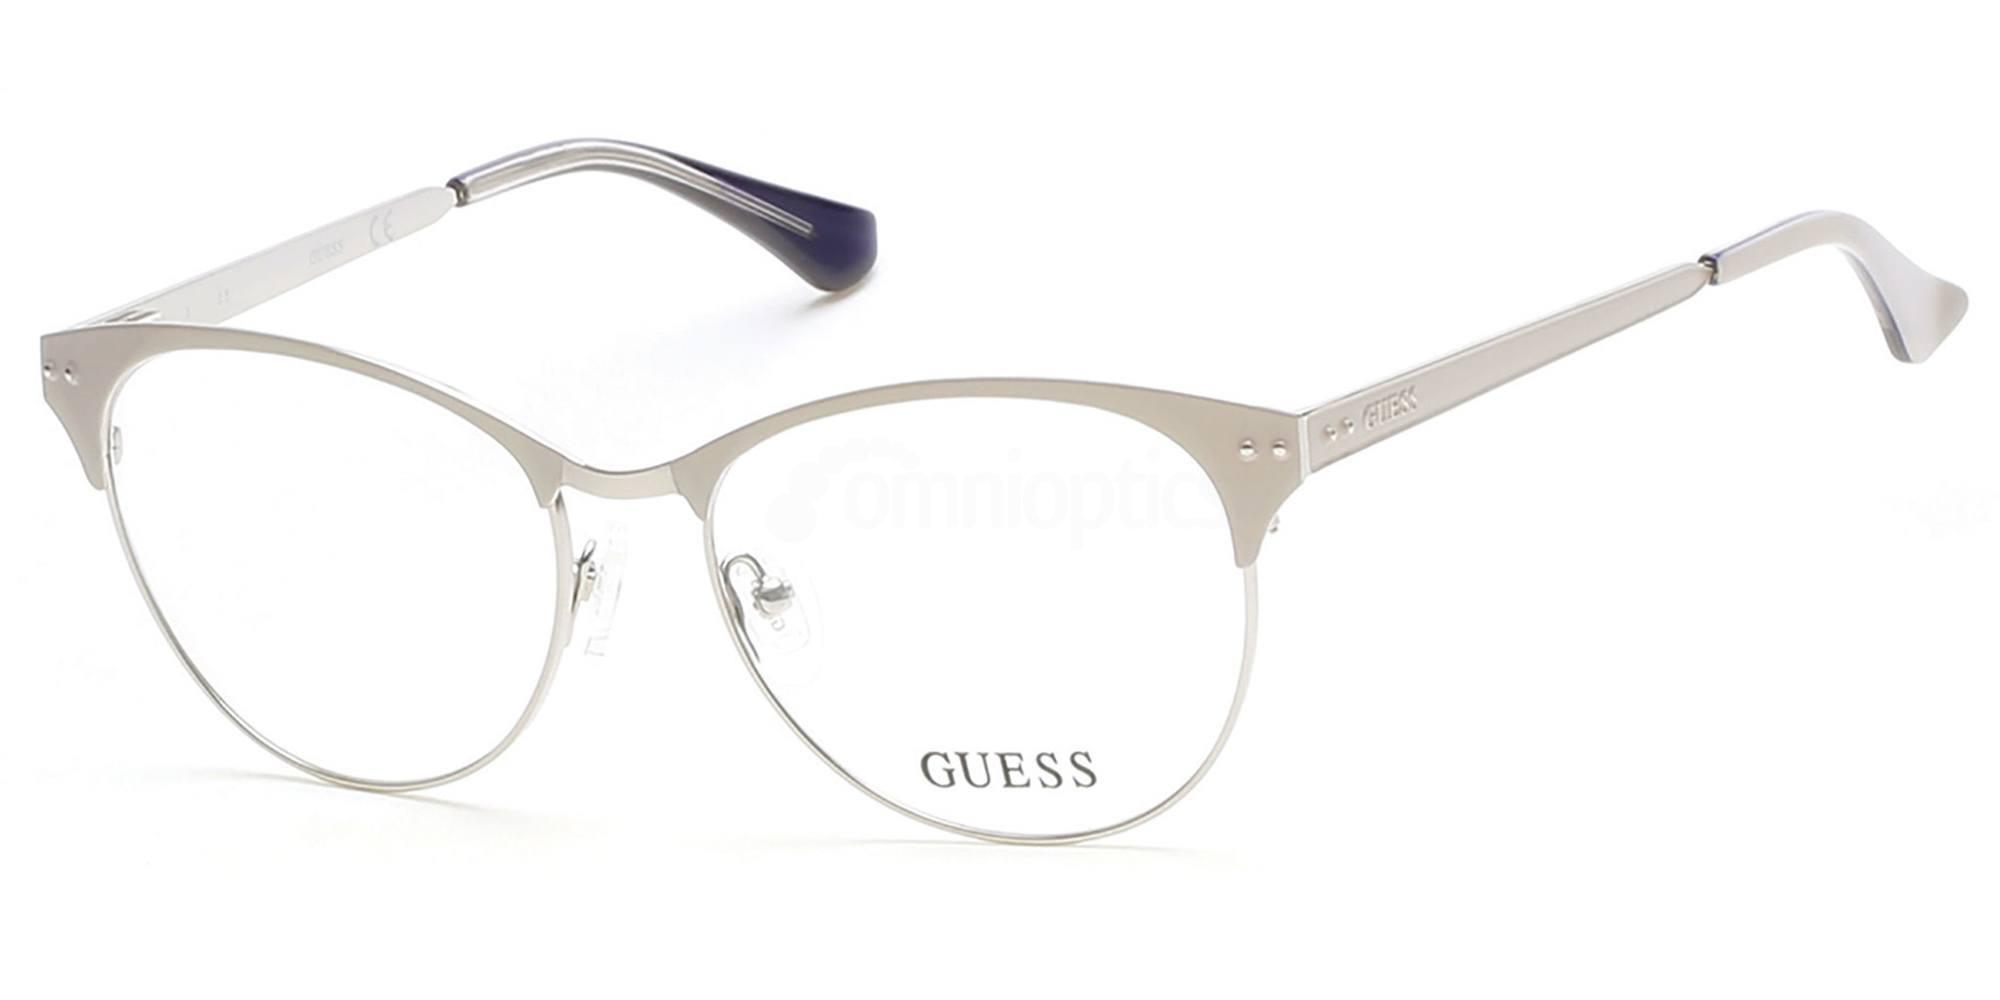 025 GU2551 , Guess